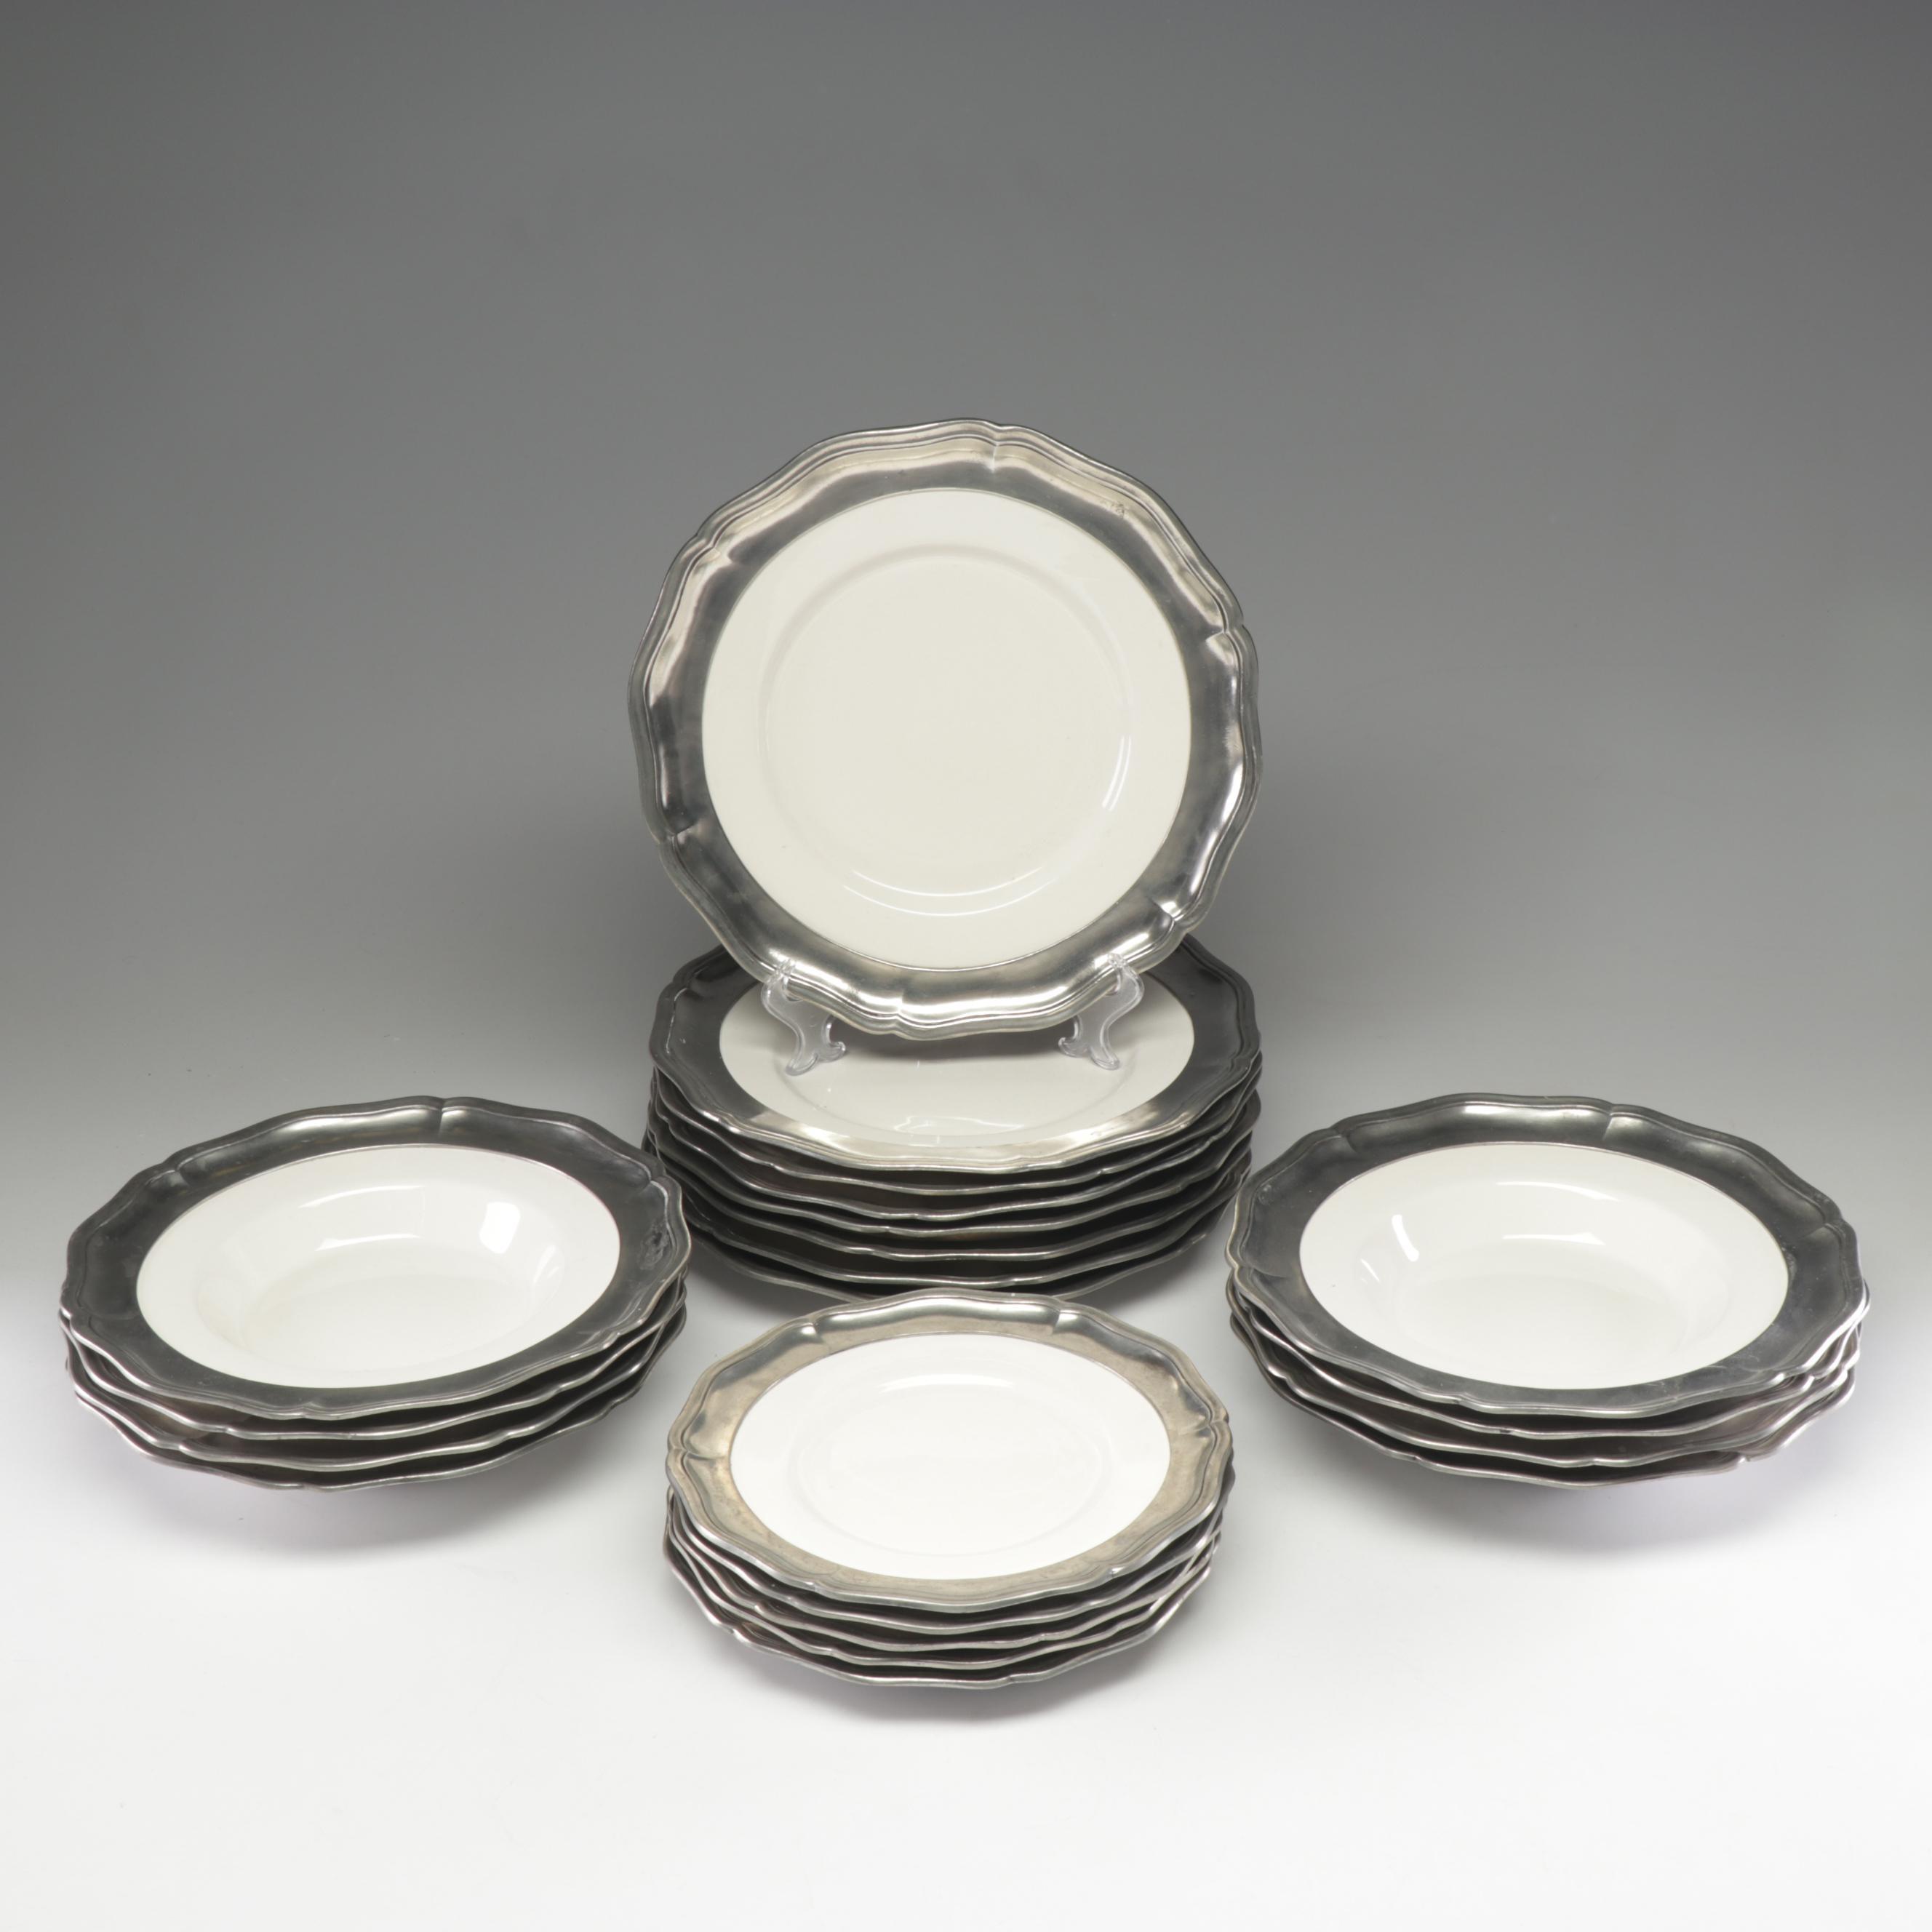 Arte Italica Dinnerware with Marinoni Pewter Rims